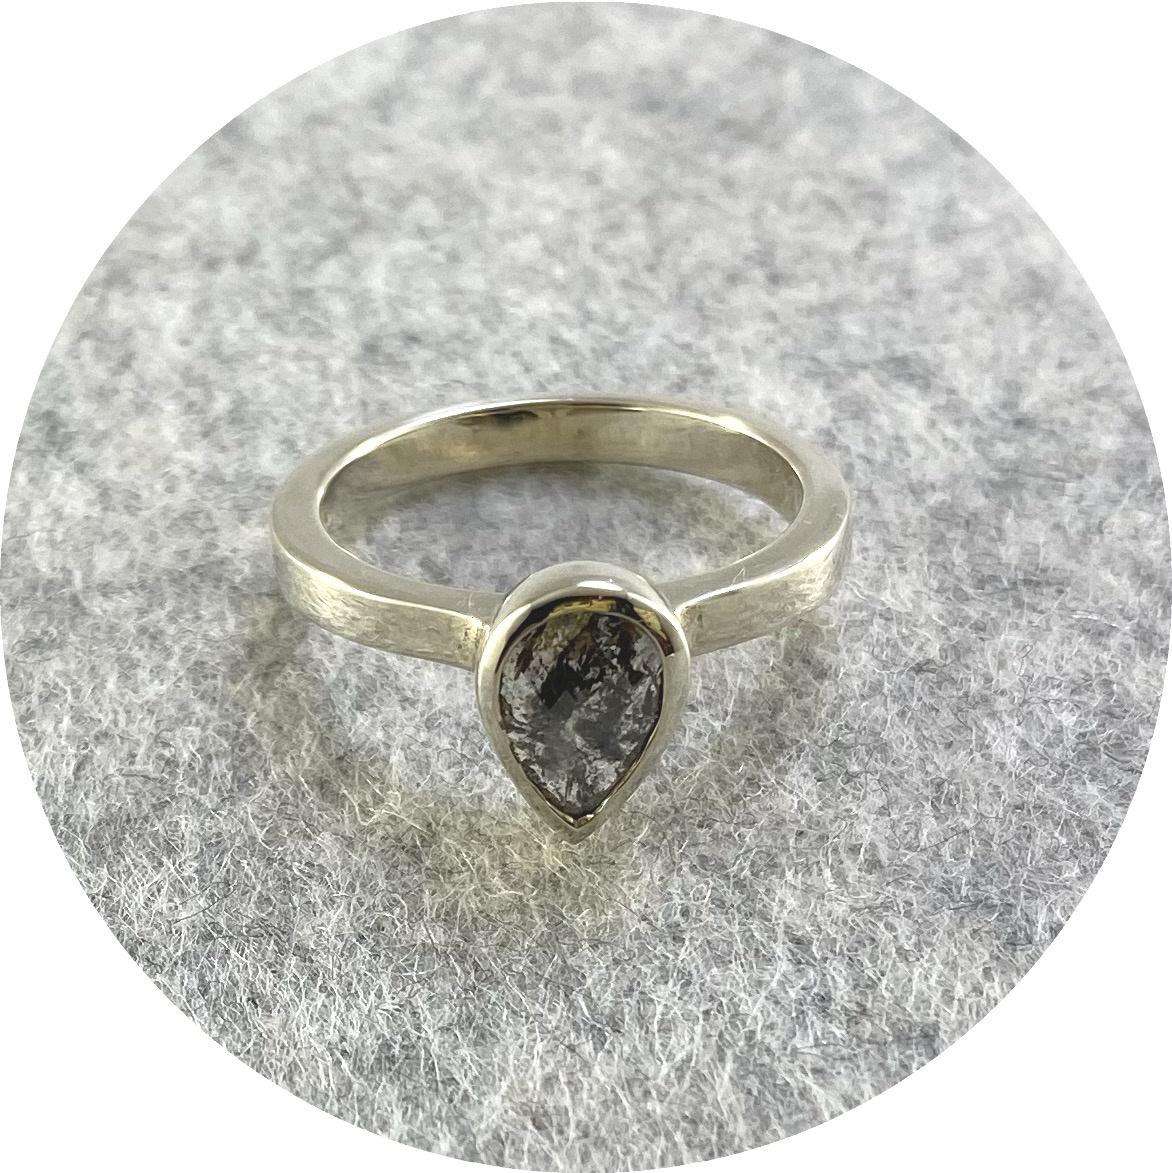 Brendan Cunningham - '1ct Pear Cut Salt and Pepper Ring', 9ct white gold K.5